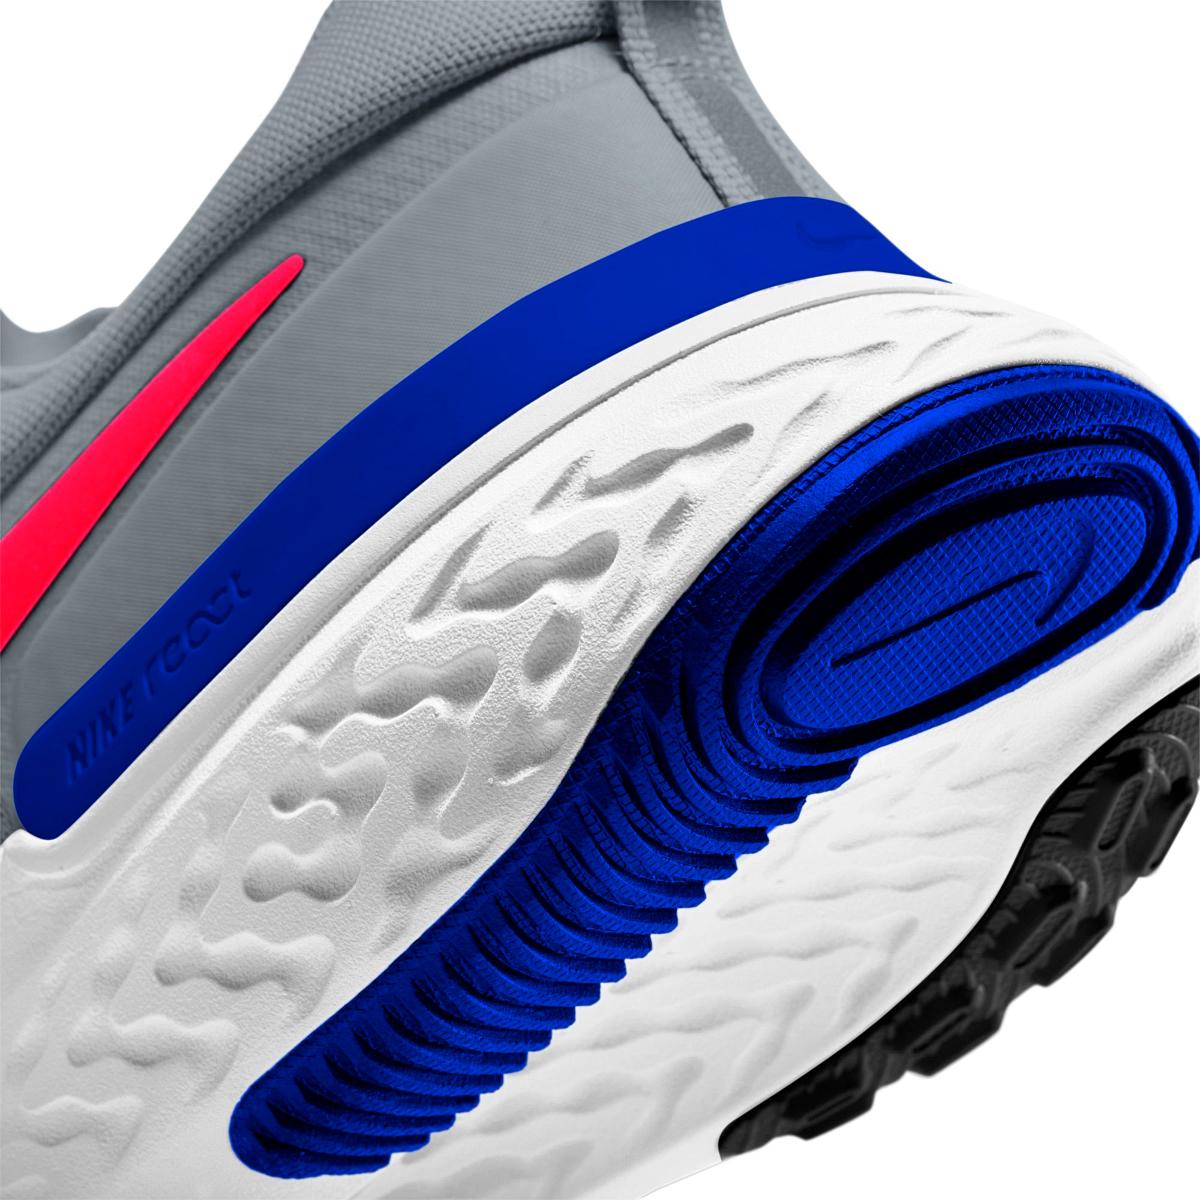 Men's Nike React Miler Running Shoe - Color: Pure Platinum/Racer Blue/Platinum Tint/Bright Crimson - Size: 6 - Width: Regular, Pure Platinum/Racer Blue/Platinum Tint/Bright Crimson, large, image 4